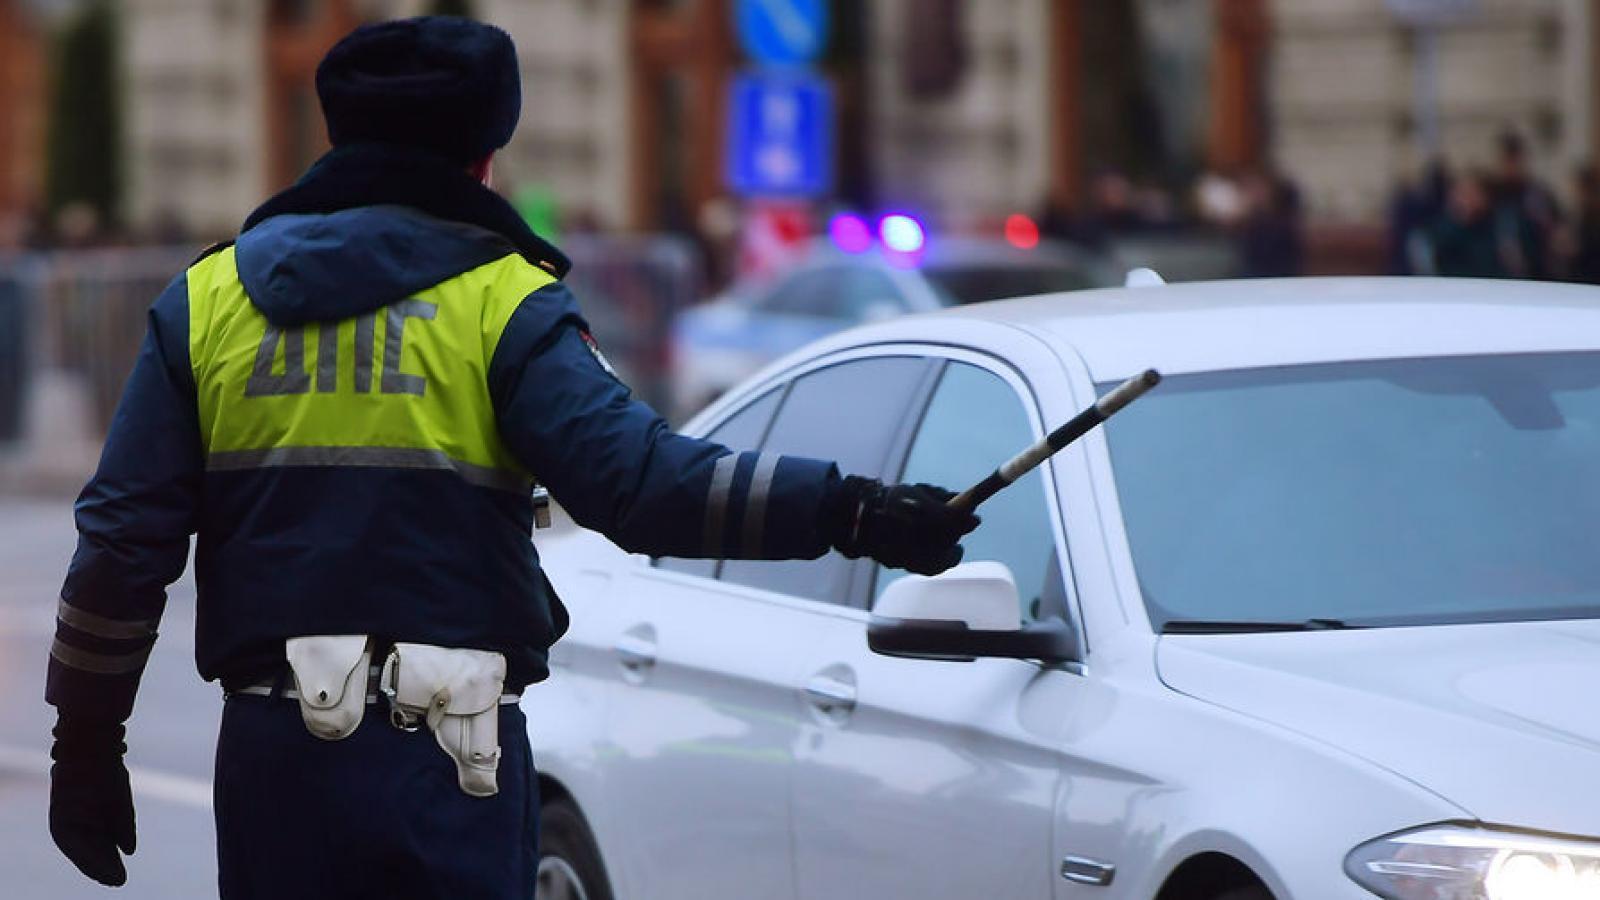 В Твери 24-летний водитель-наркоман не доехал до ночного клуба